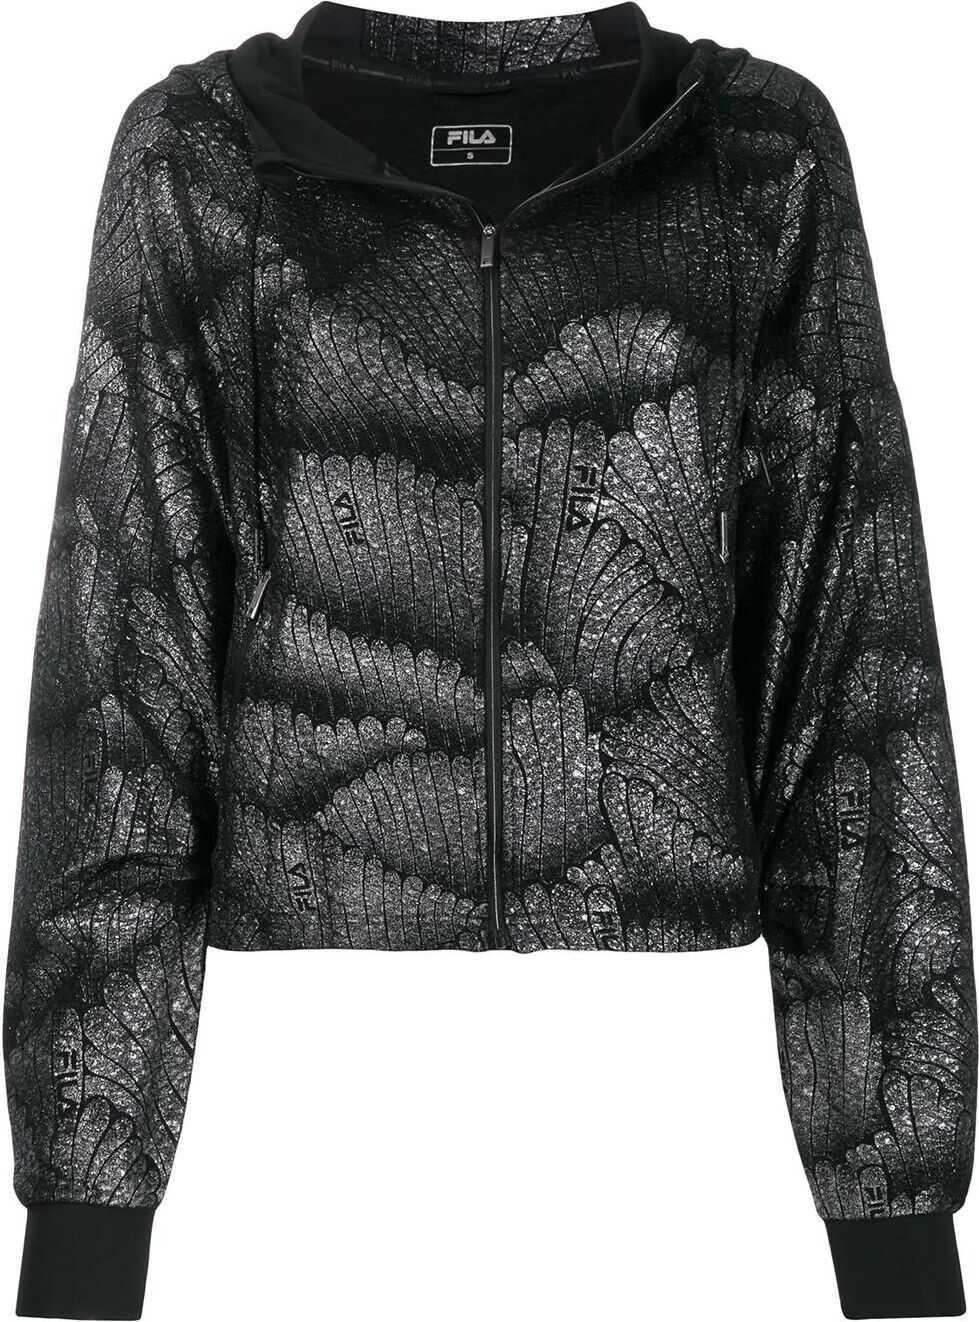 Fila Synthetic Fibers Sweatshirt BLACK